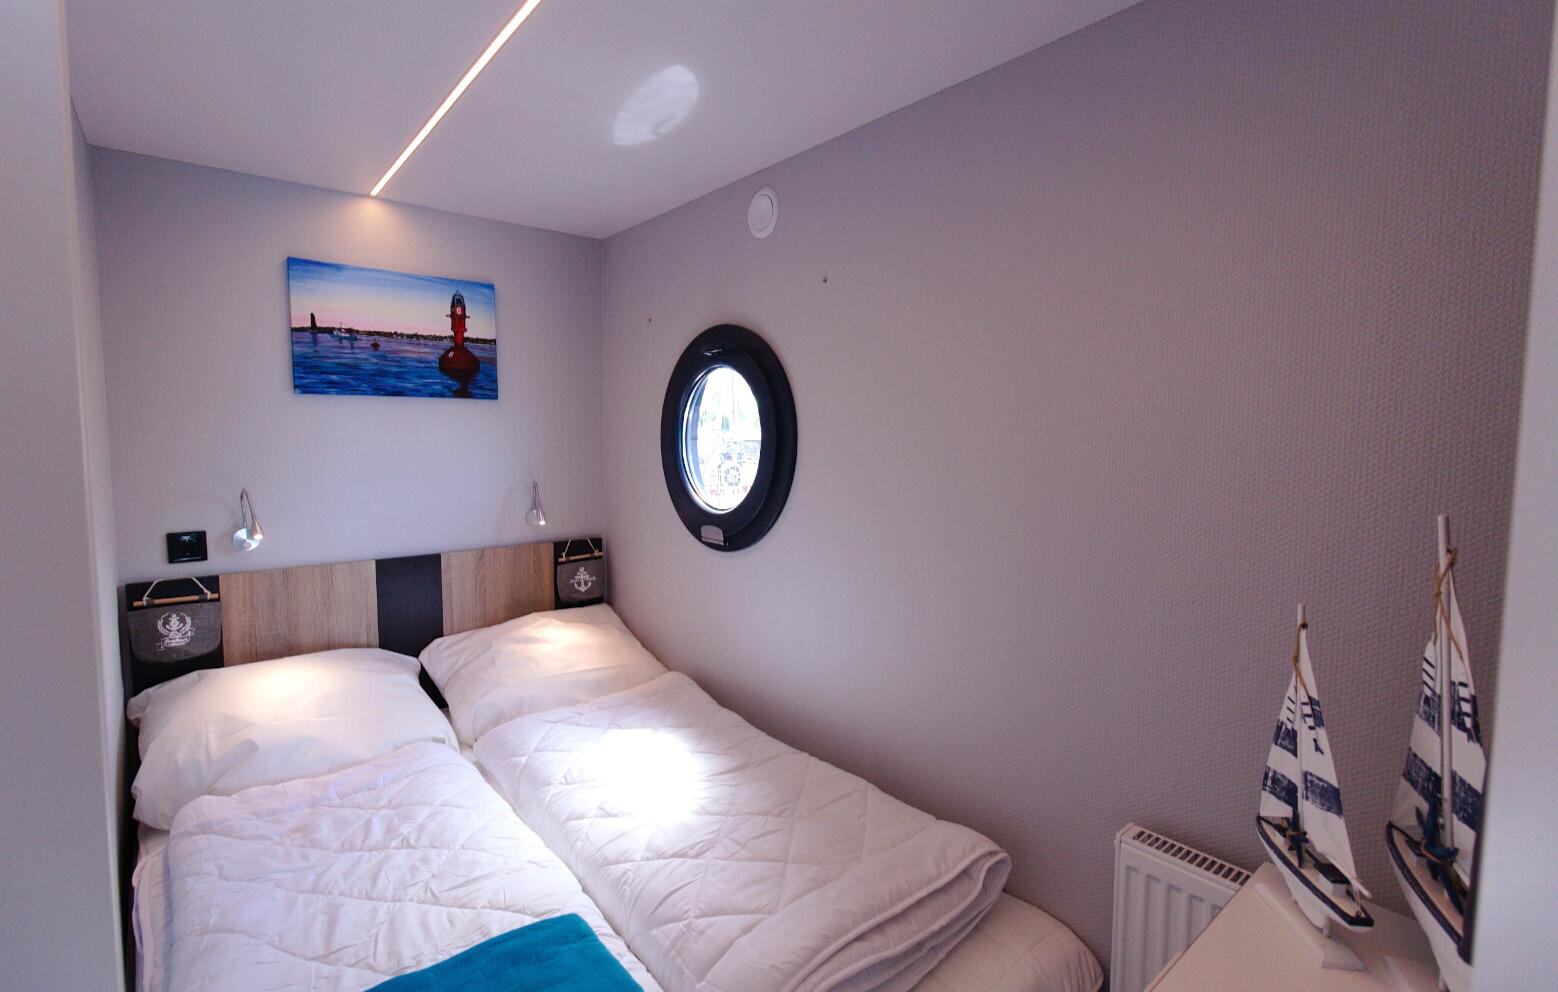 hausboot-kurzulaub-ohne-sauna-5-tage-4-uen-4-personen-bg1